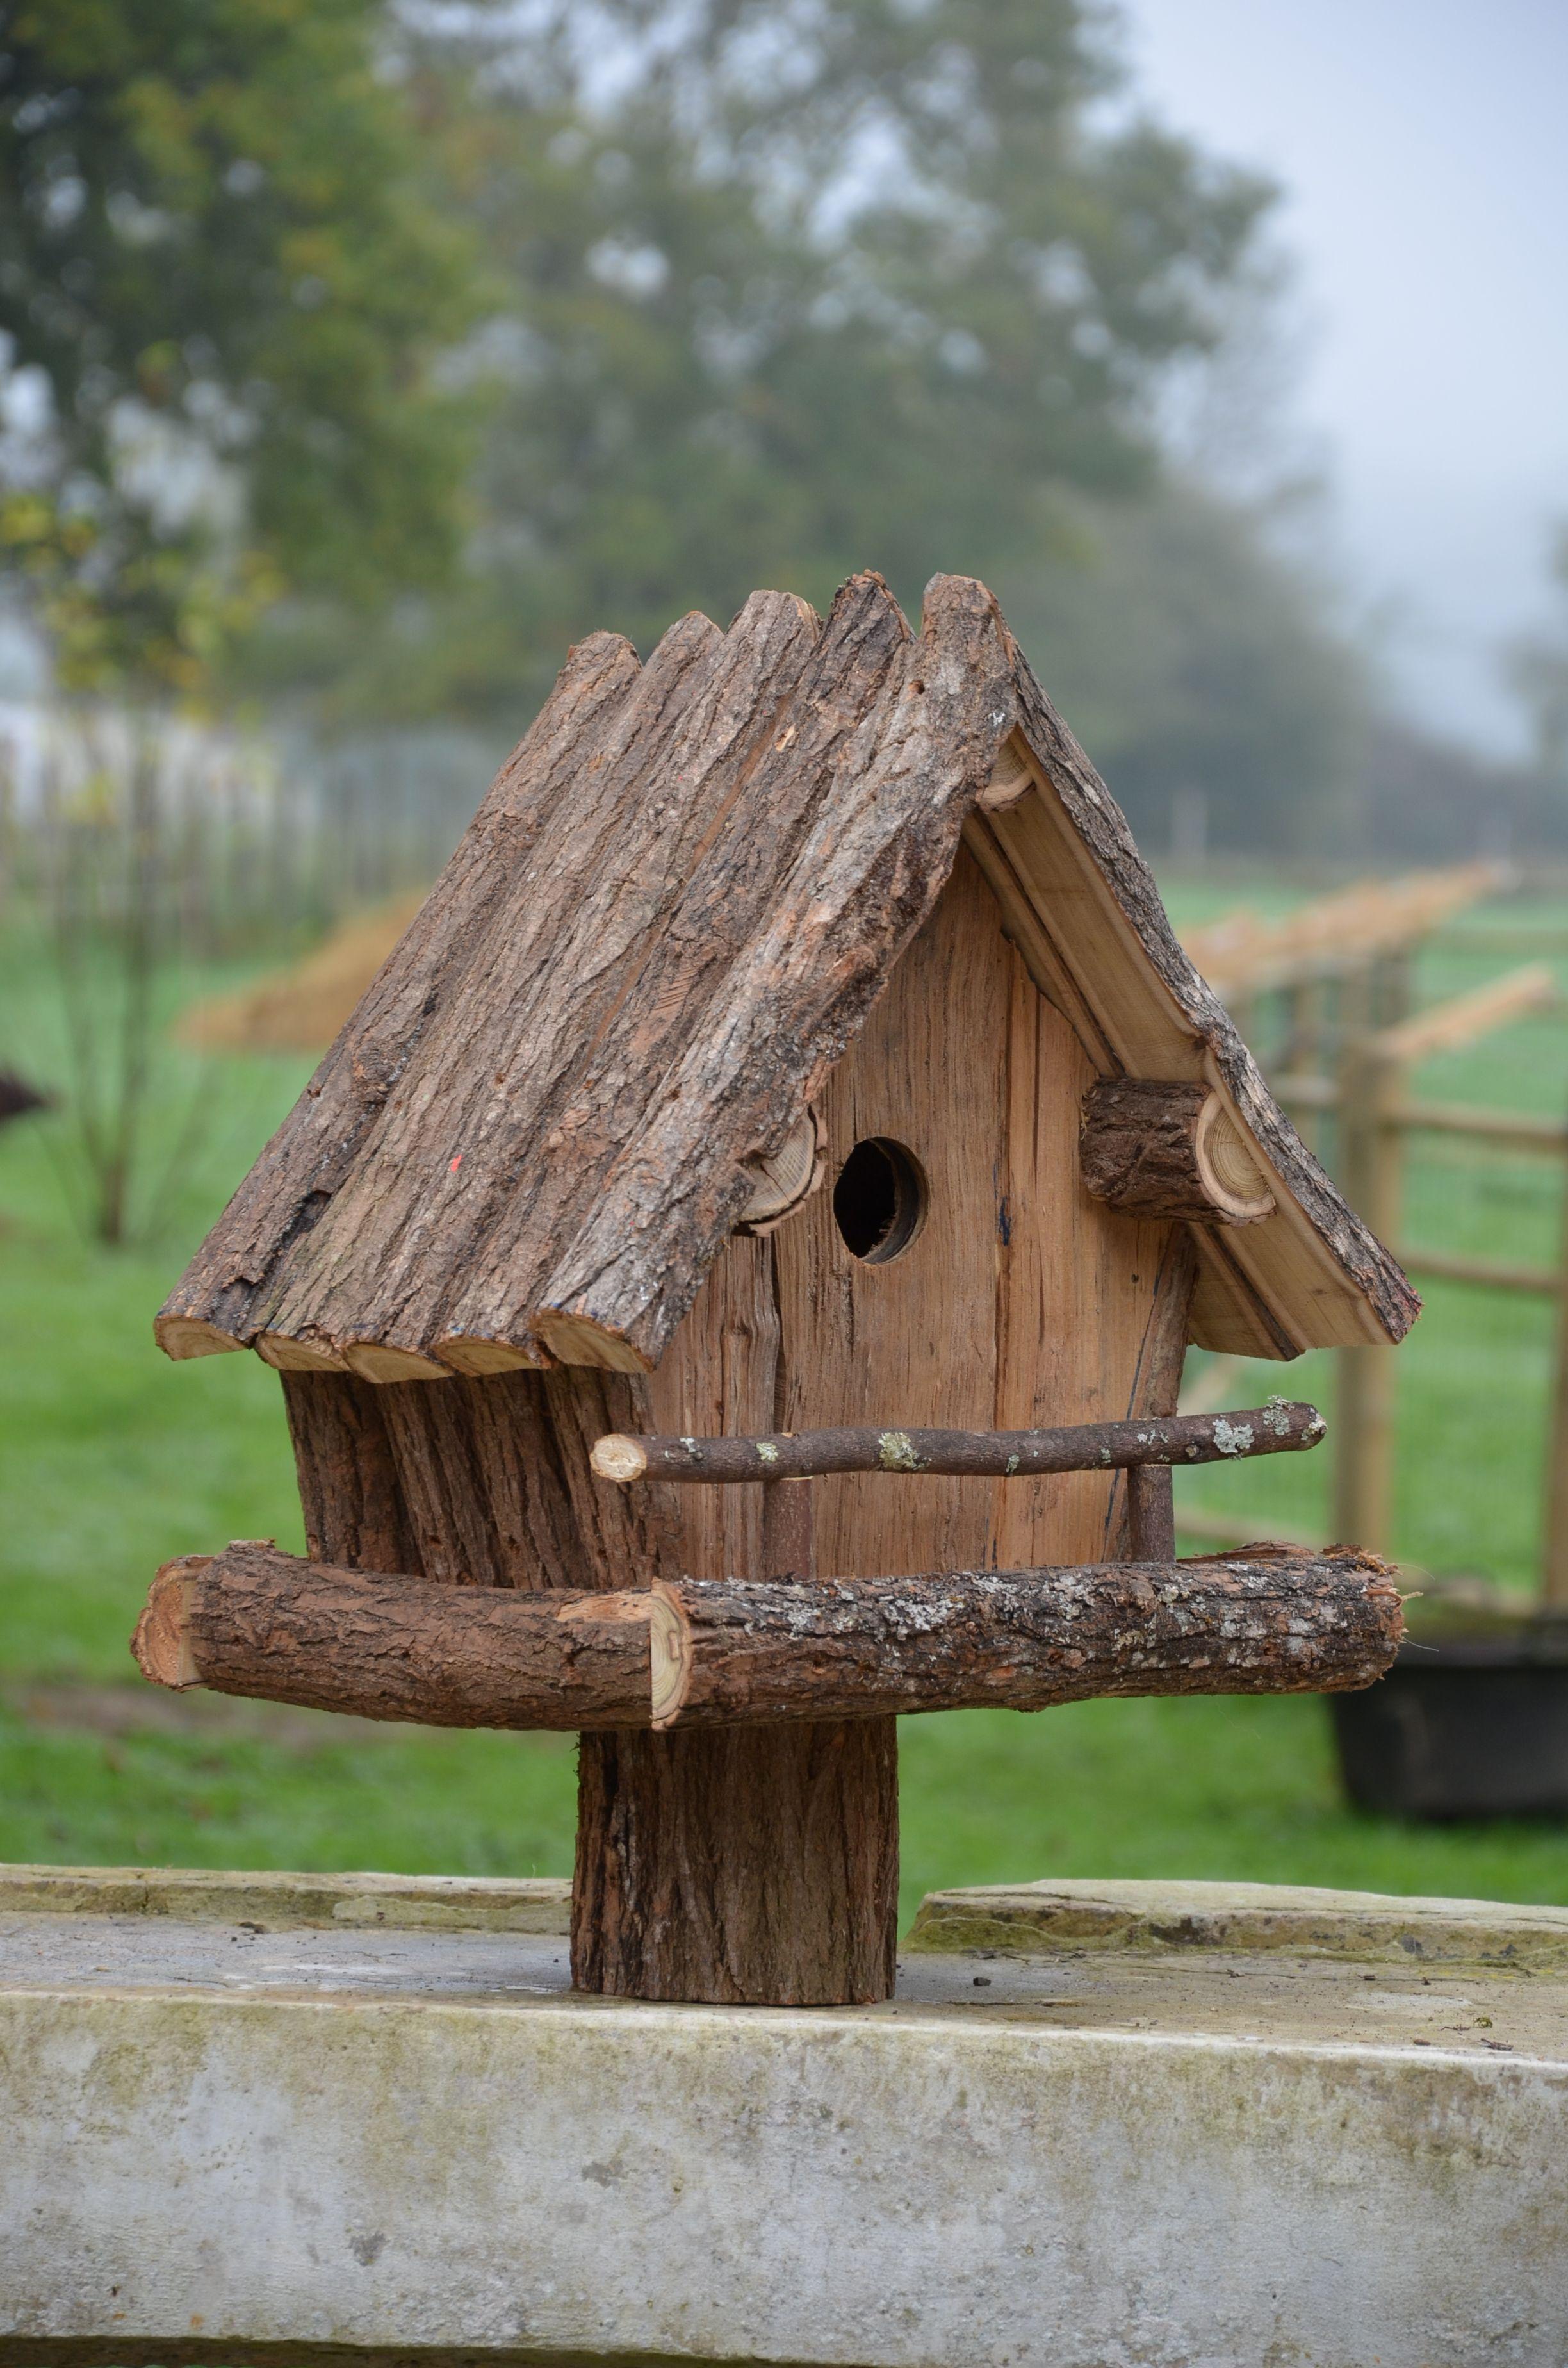 mangeoire brut mangeoires nichoirs oiseaux bird houses birds et bird feeders. Black Bedroom Furniture Sets. Home Design Ideas